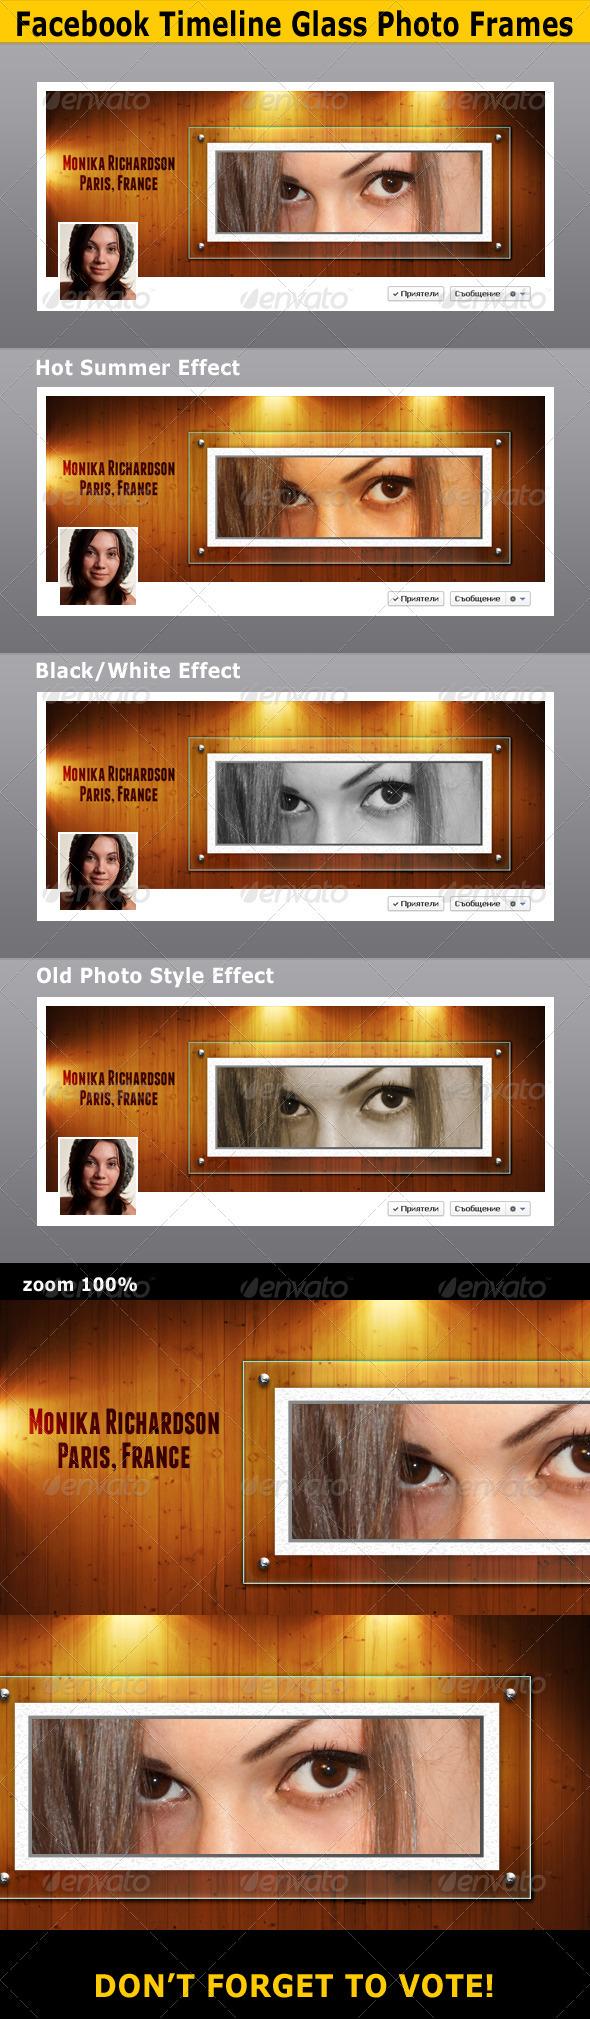 GraphicRiver FB Timeline Glass Photo Frames 3433923